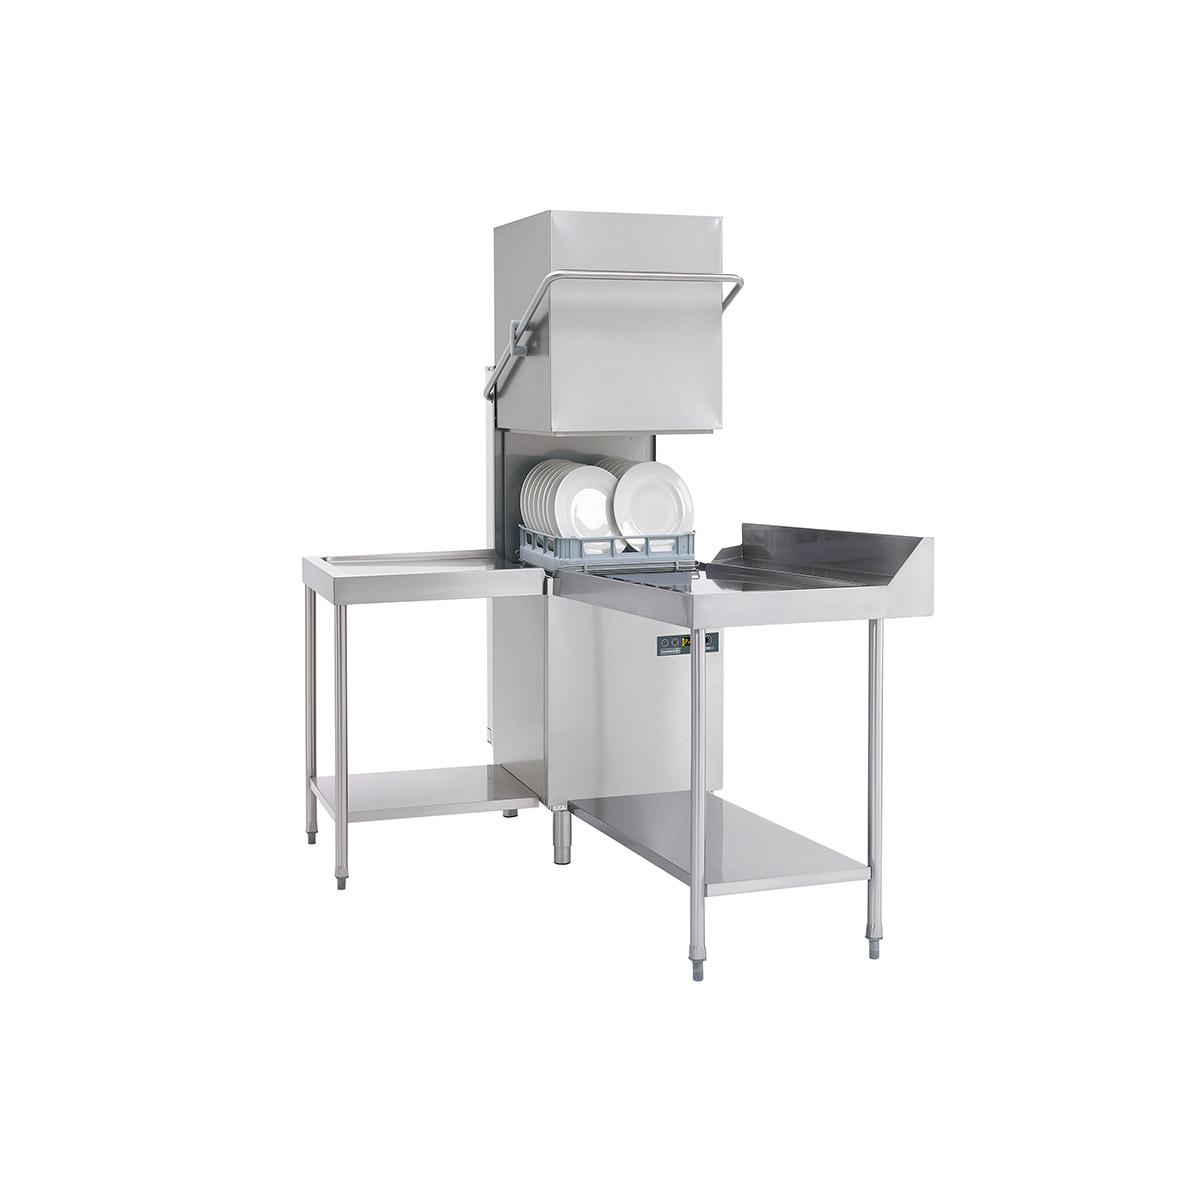 Maidaid Halcyon Passthrough Dishwasher C1035WS